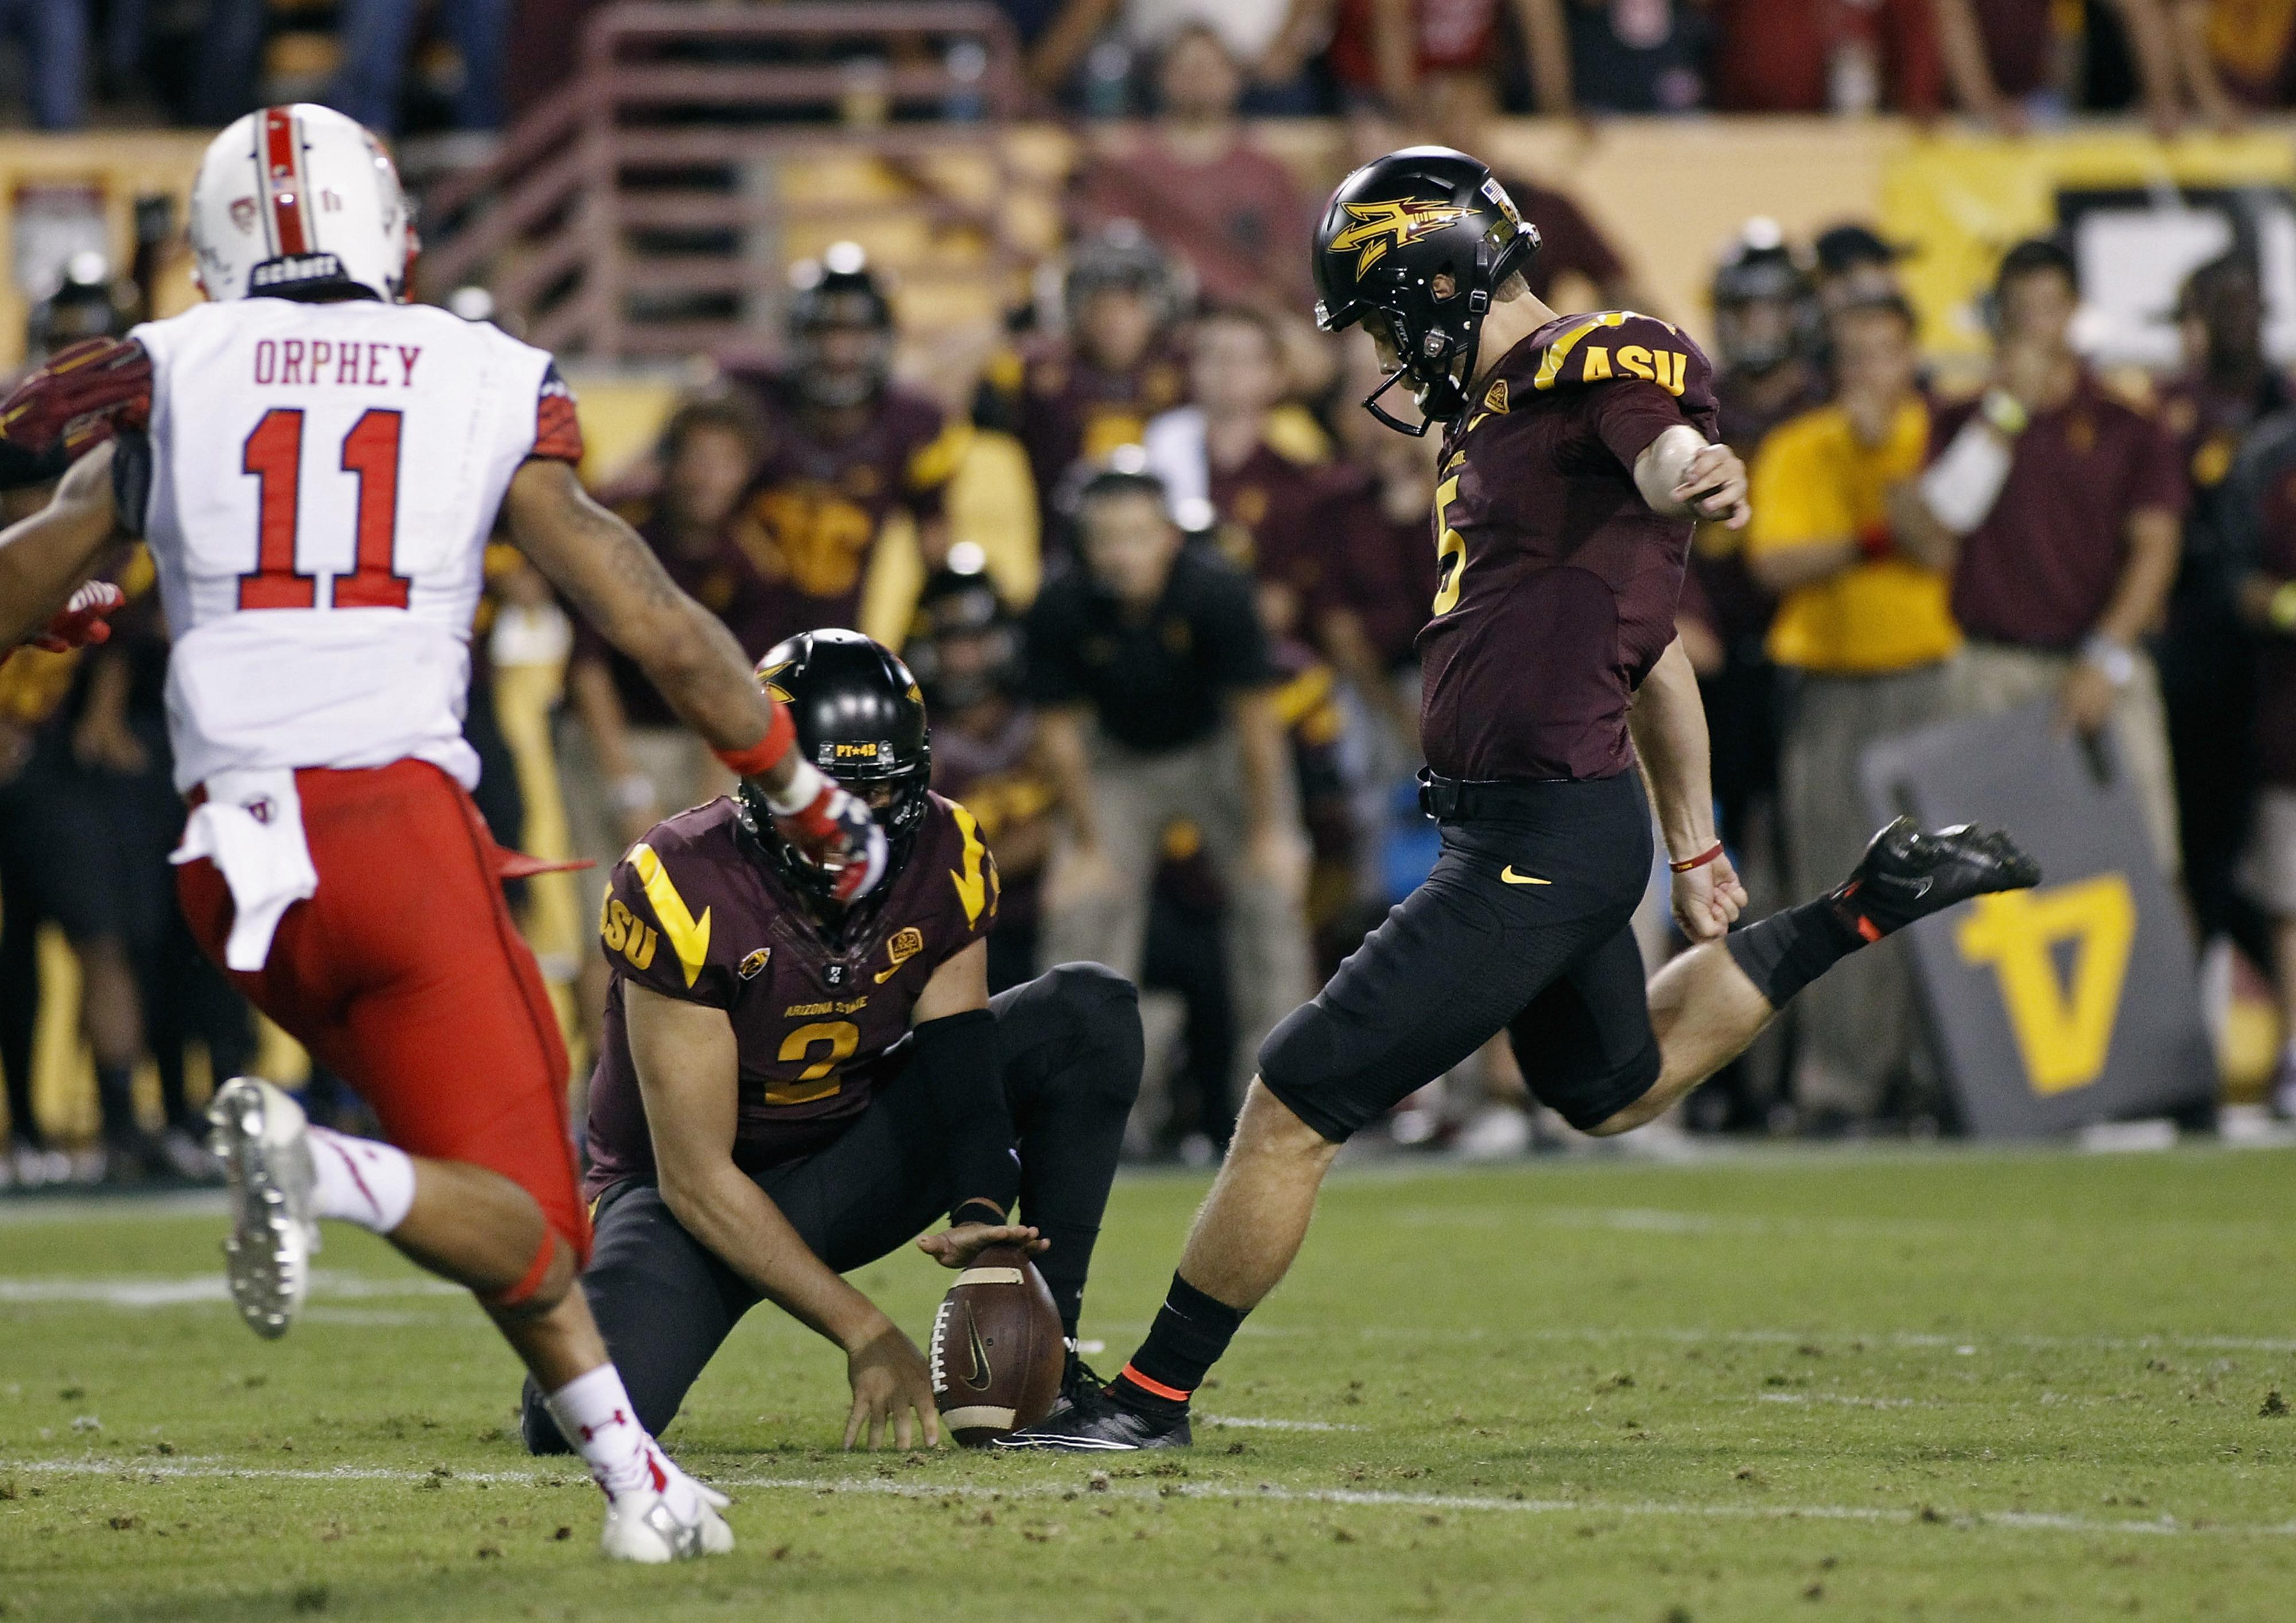 Arizona State kicker Zane Gonzalez boots the game-winning field goal from 36 yards in overtime to beat Utah.